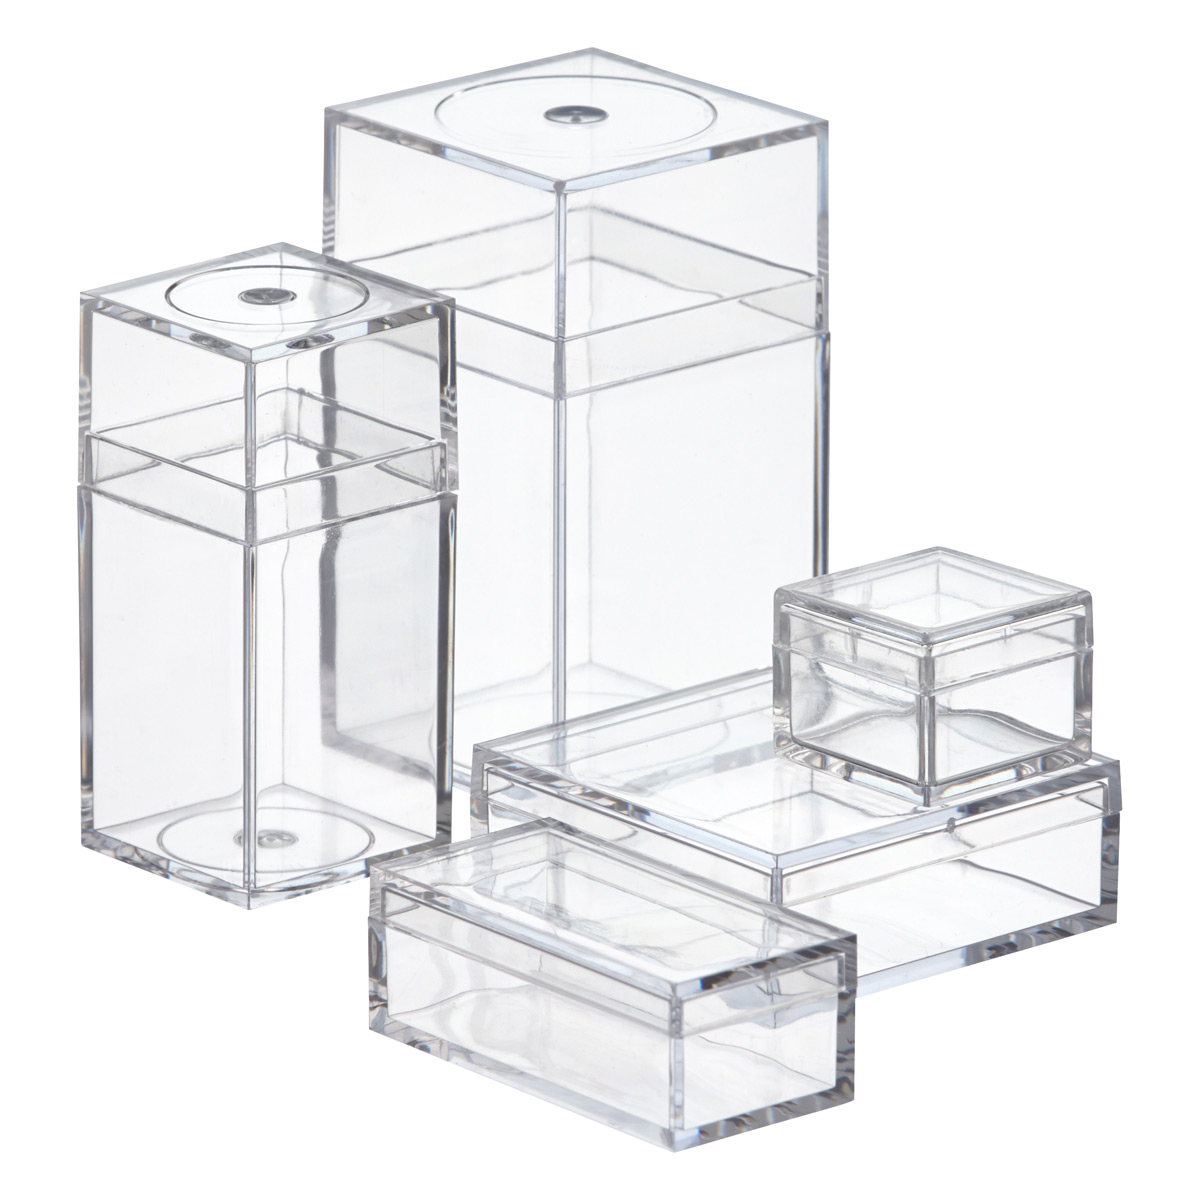 plastikbox gros great mit deckel aus kunststoff. Black Bedroom Furniture Sets. Home Design Ideas